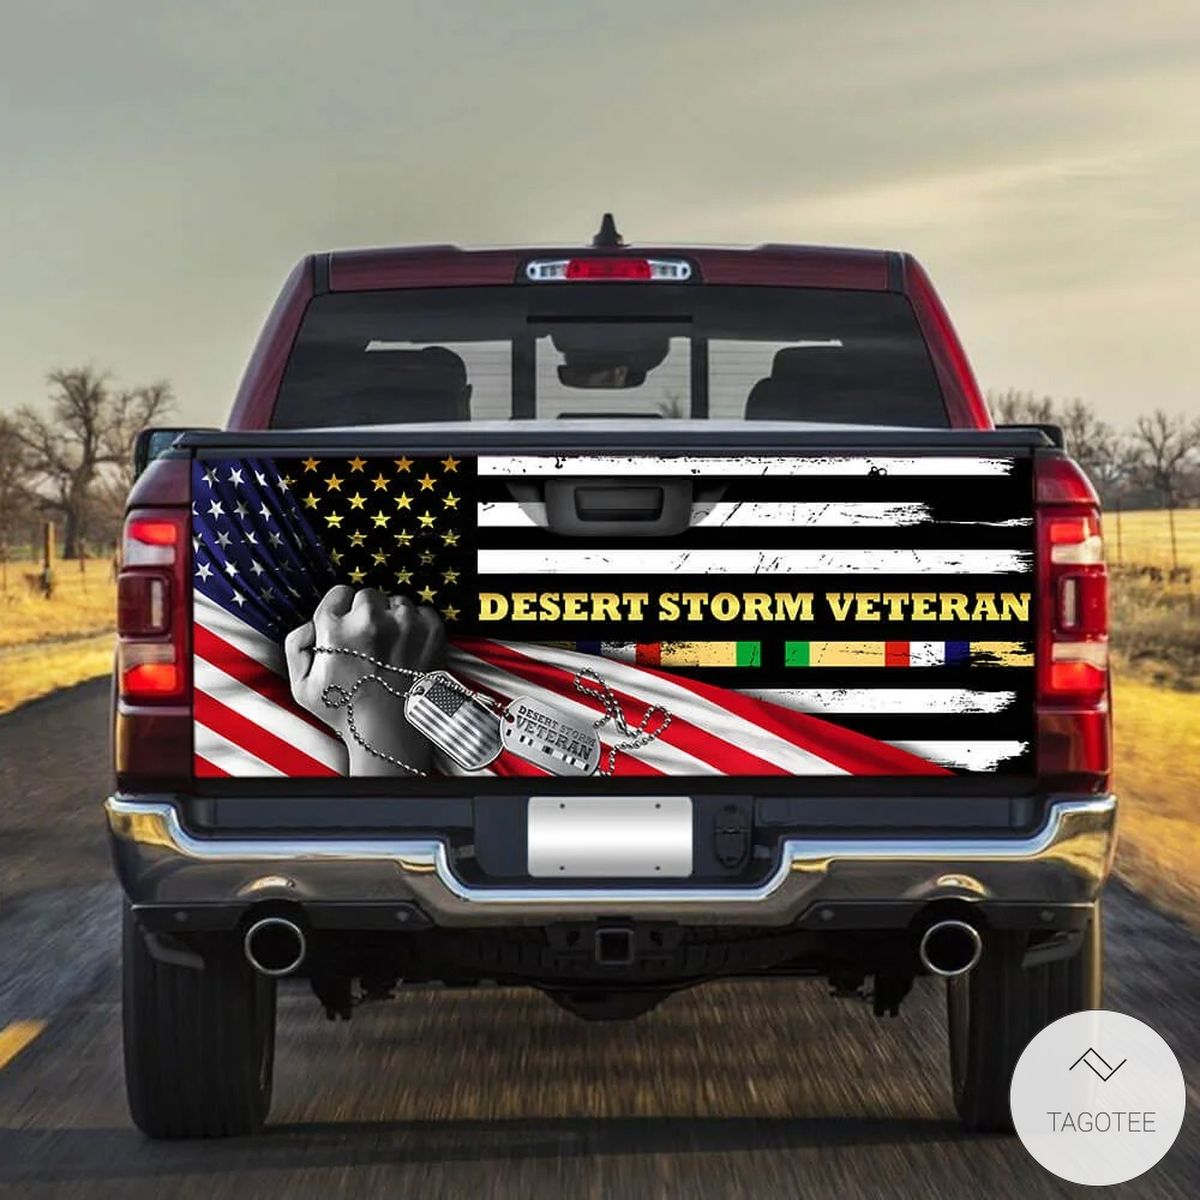 Desert Storm Veteran Tailgate Wrap